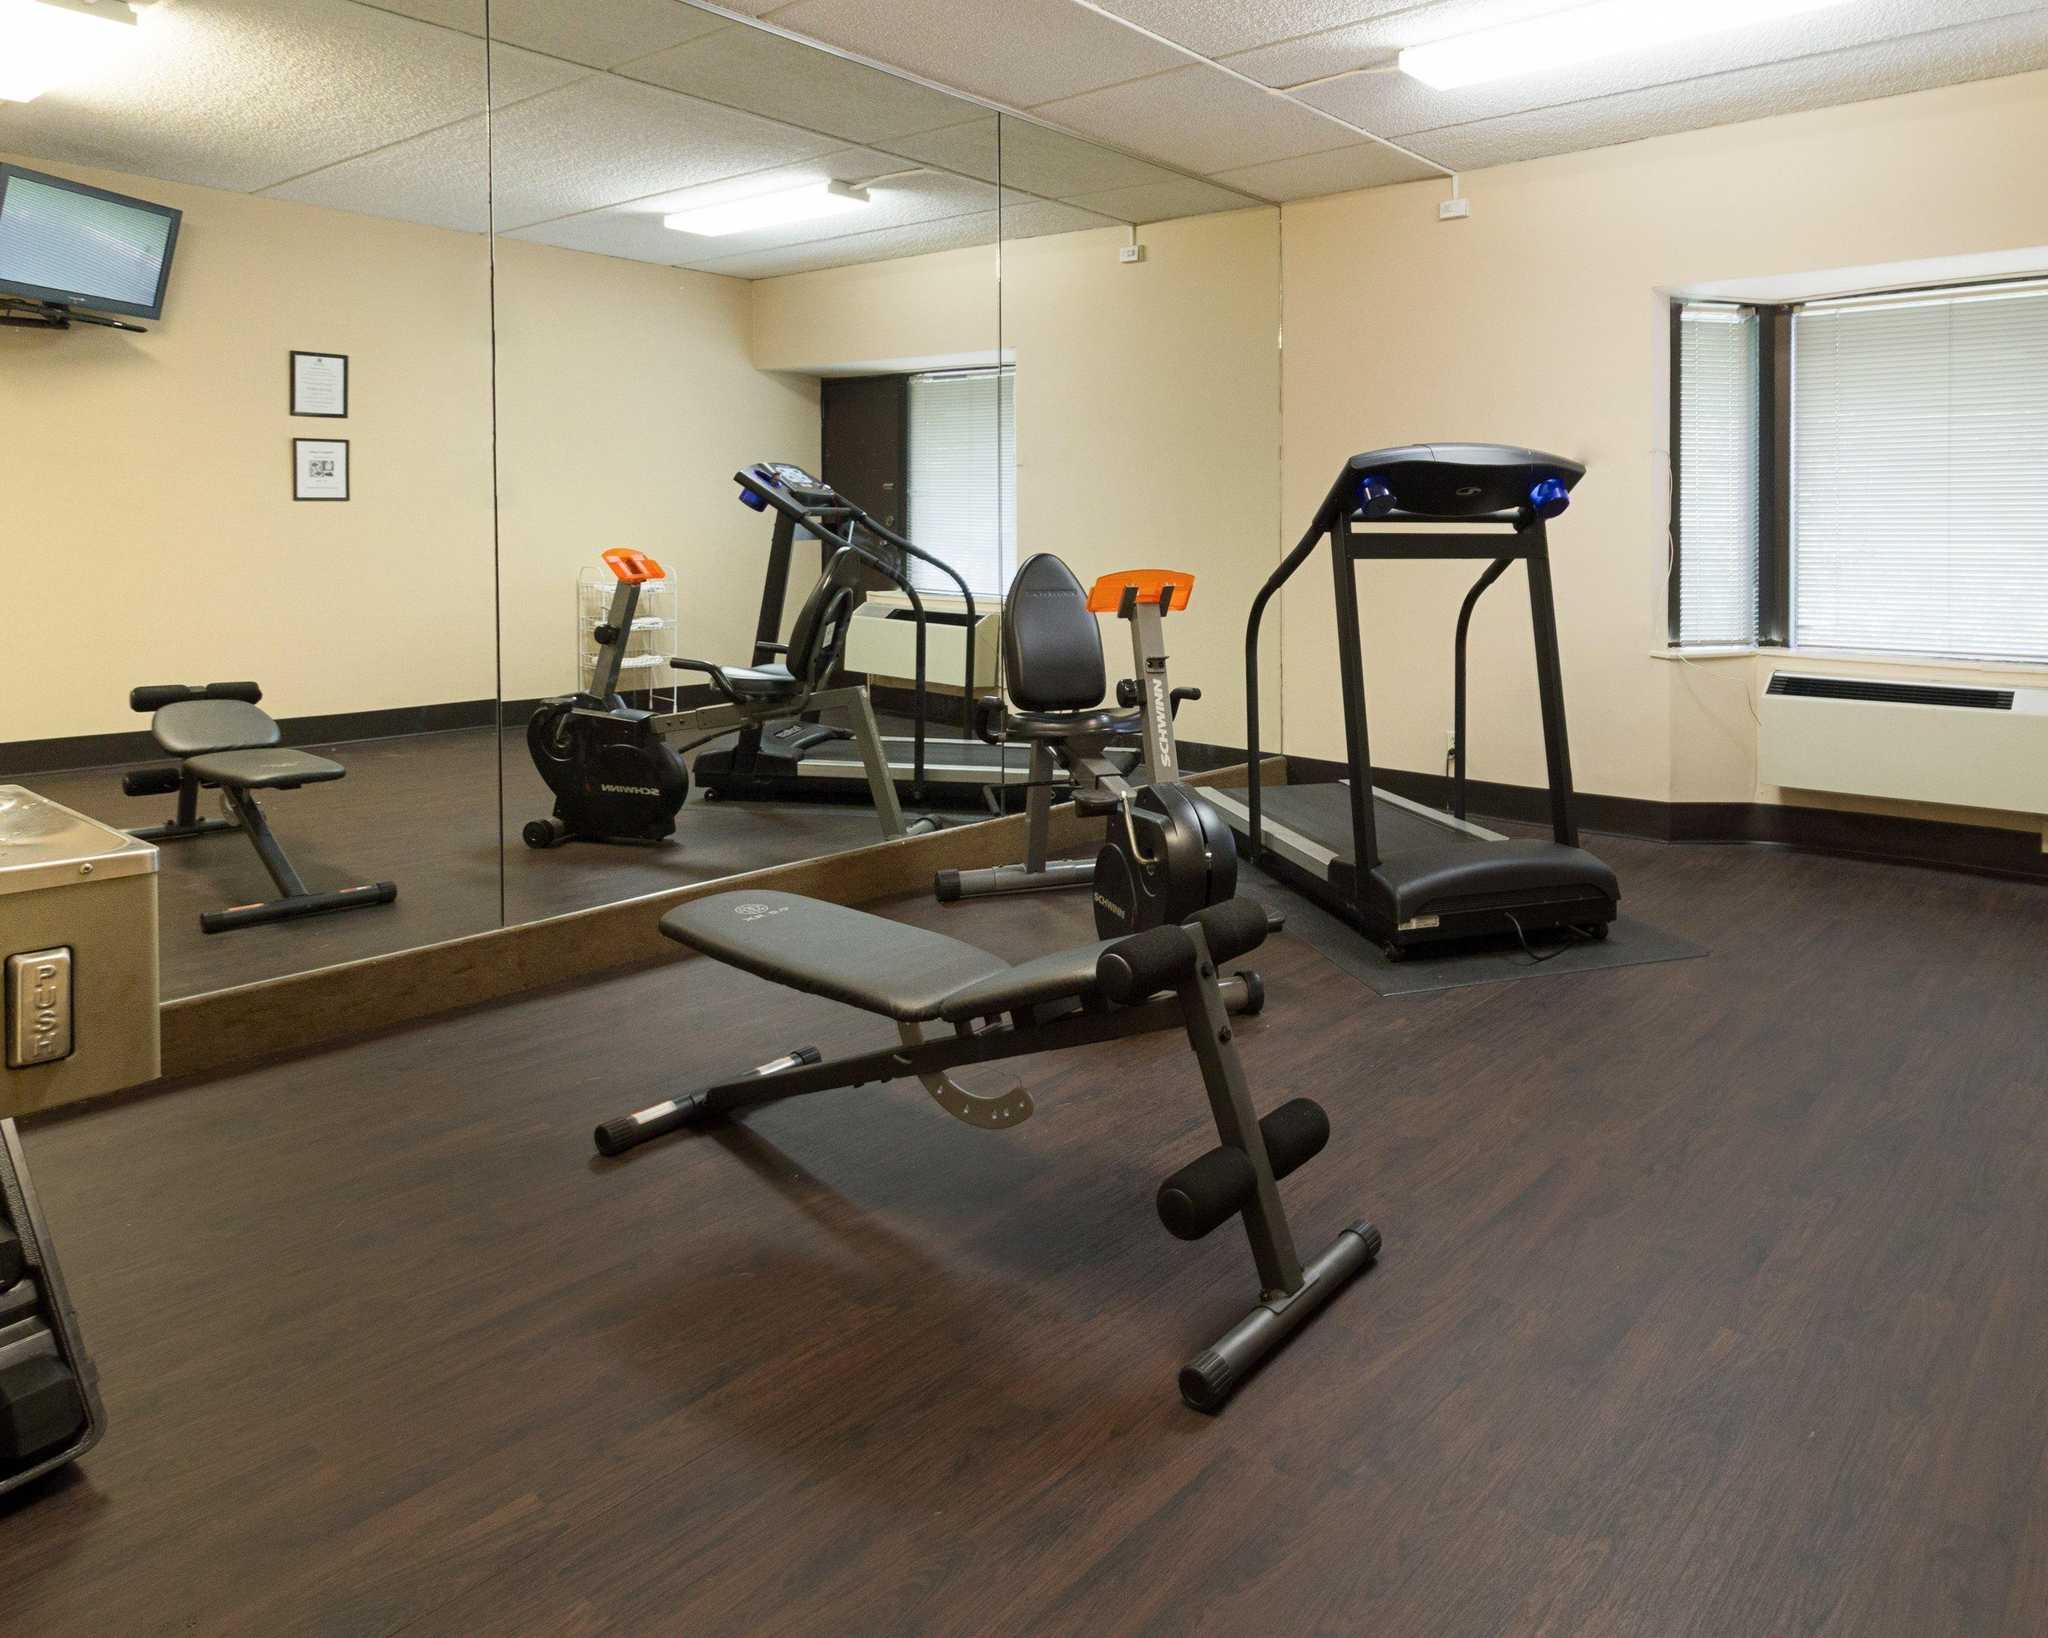 Comfort Inn Carrier Circle Syracuse (315)437-0222